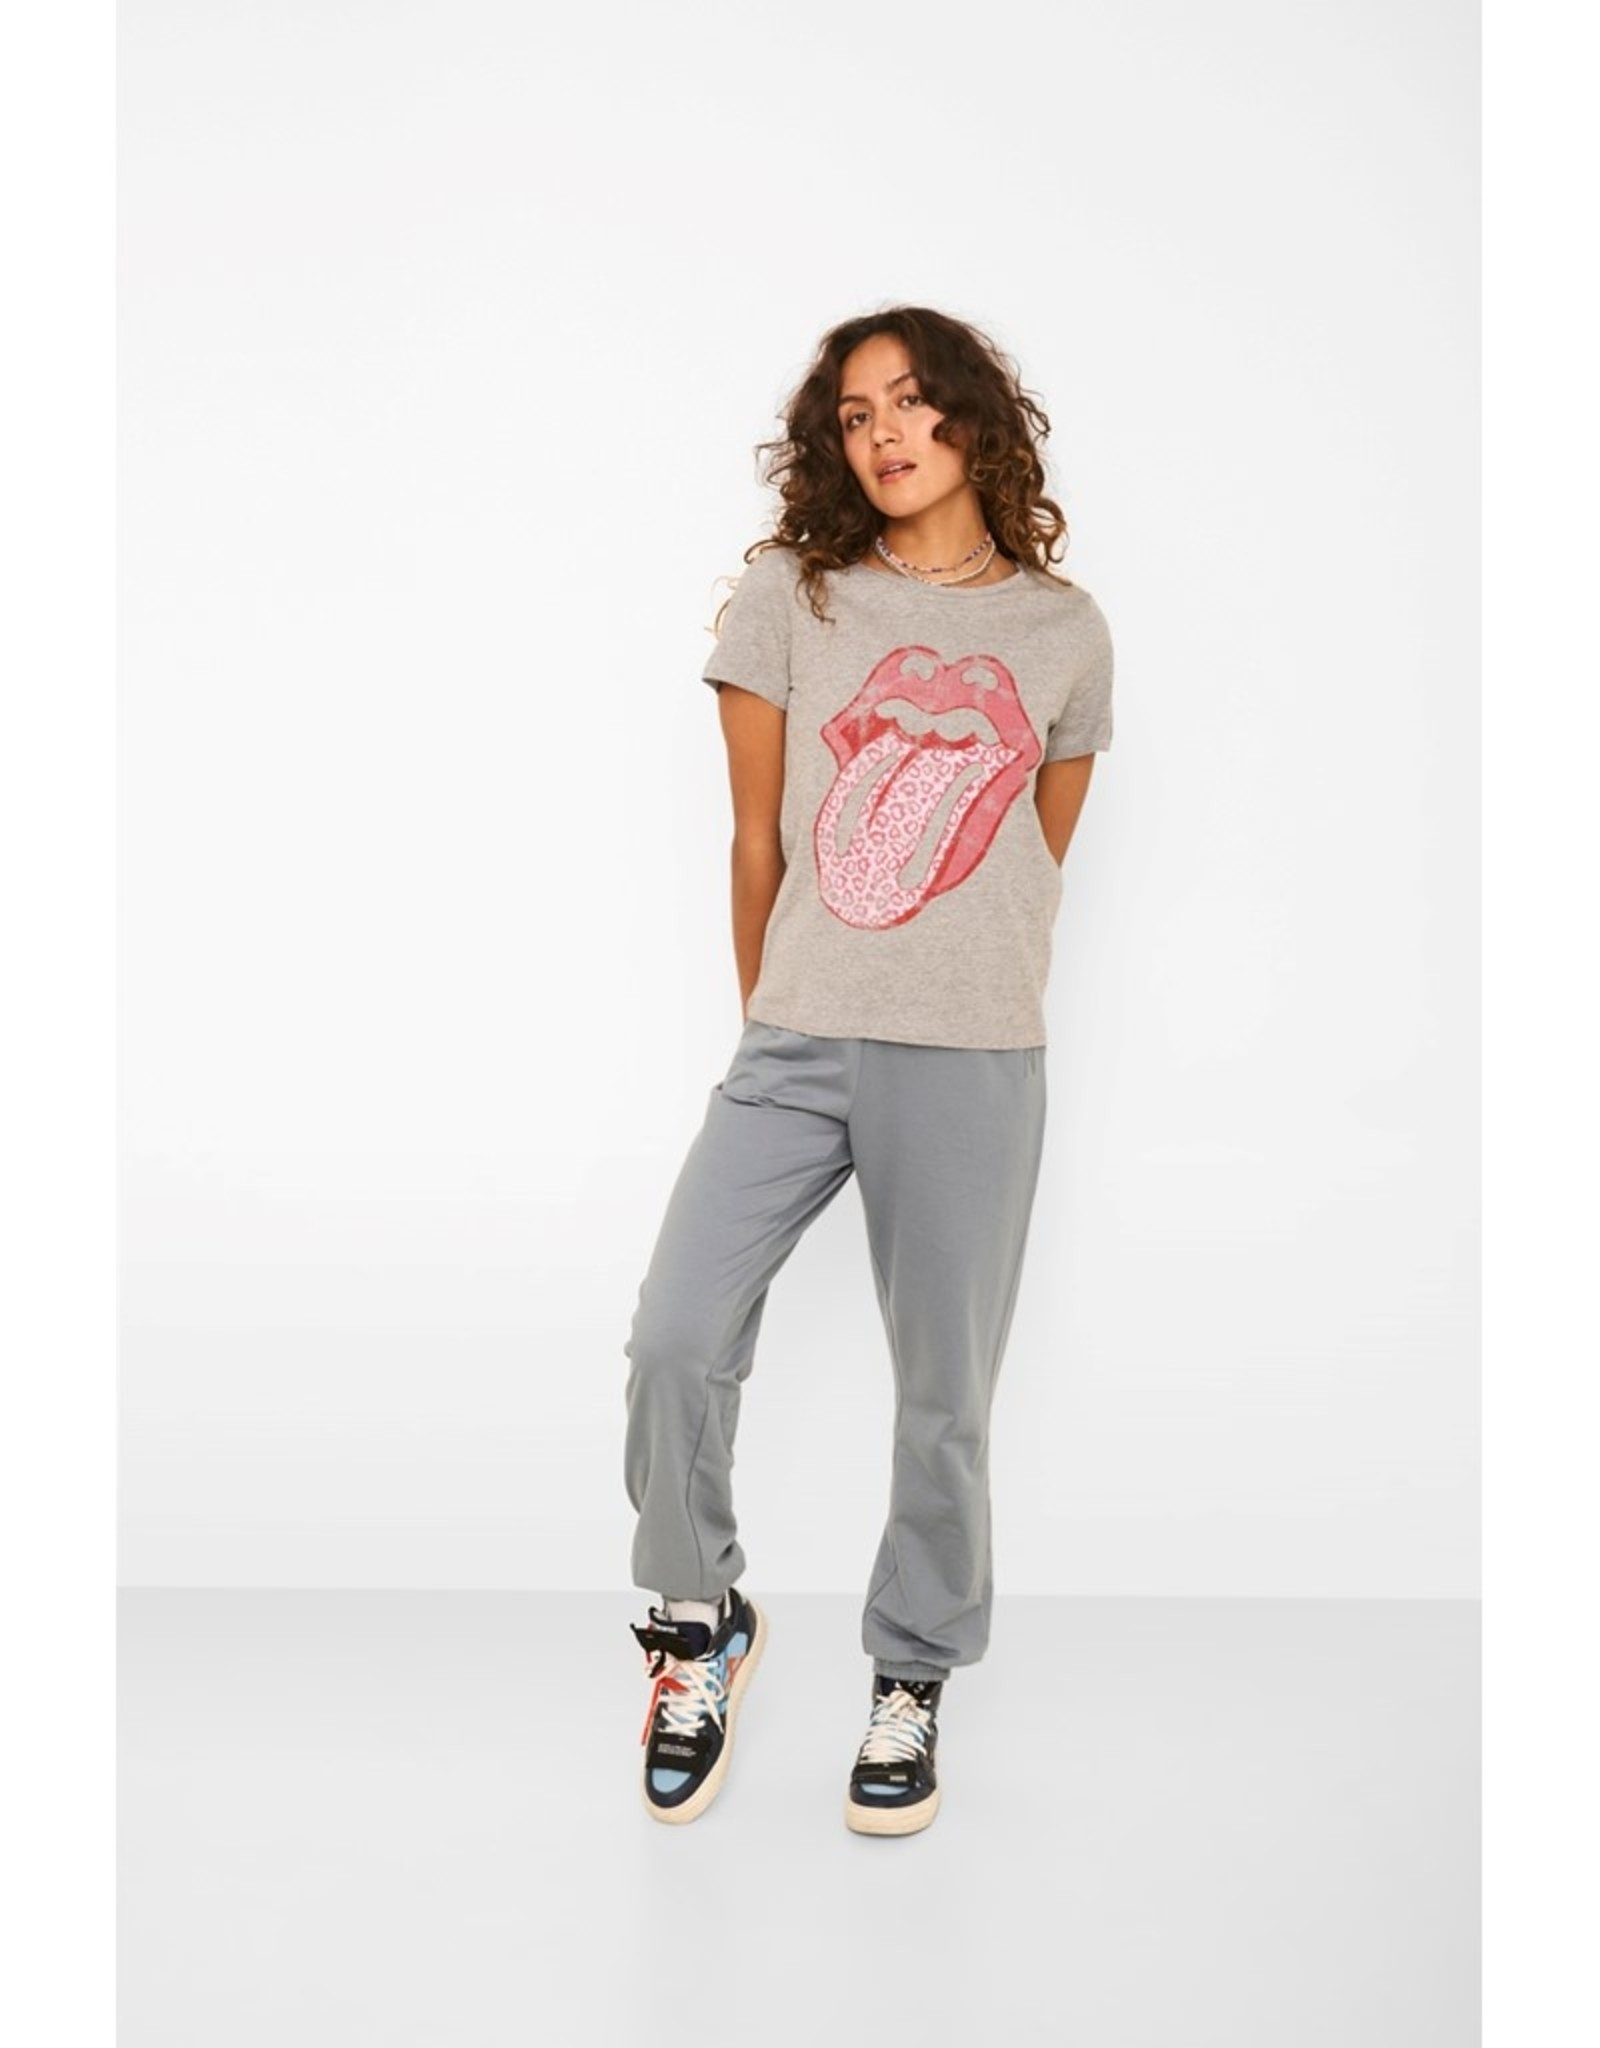 Vero Moda Nate Rolling Stones Band Tee